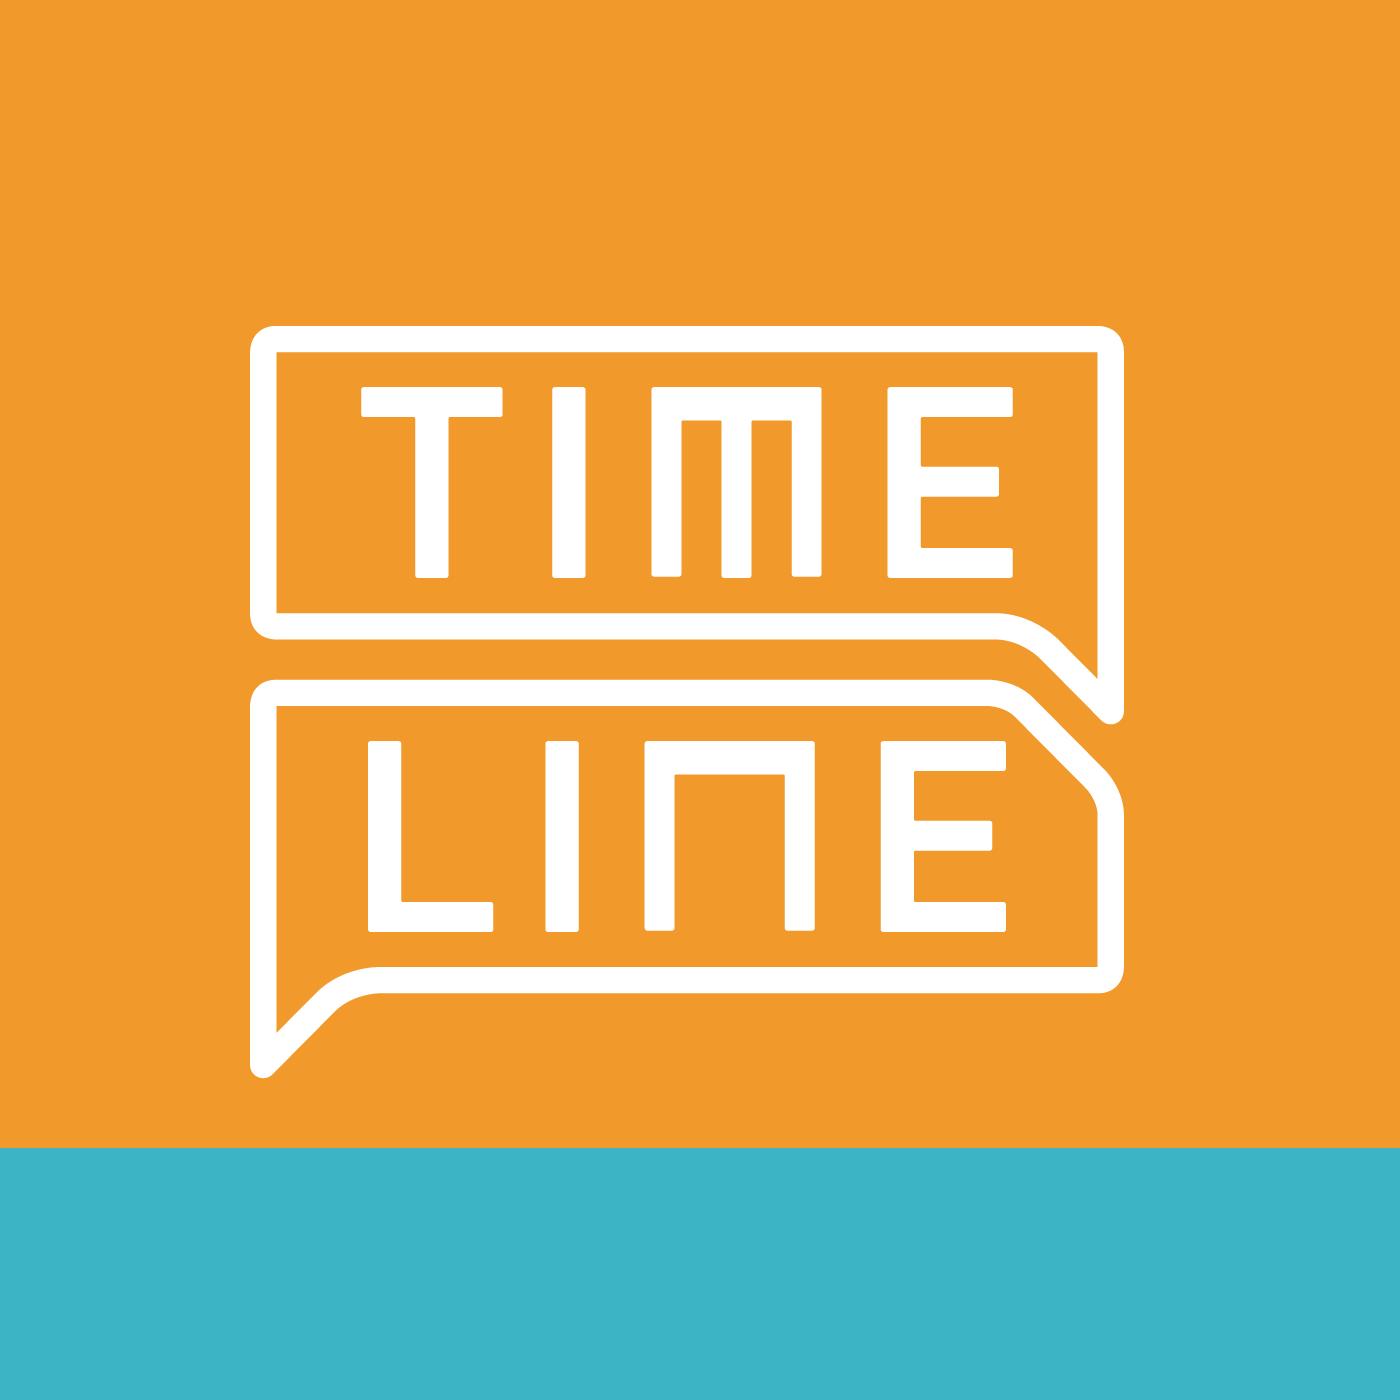 Timeline Gaúcha 23/01/2018